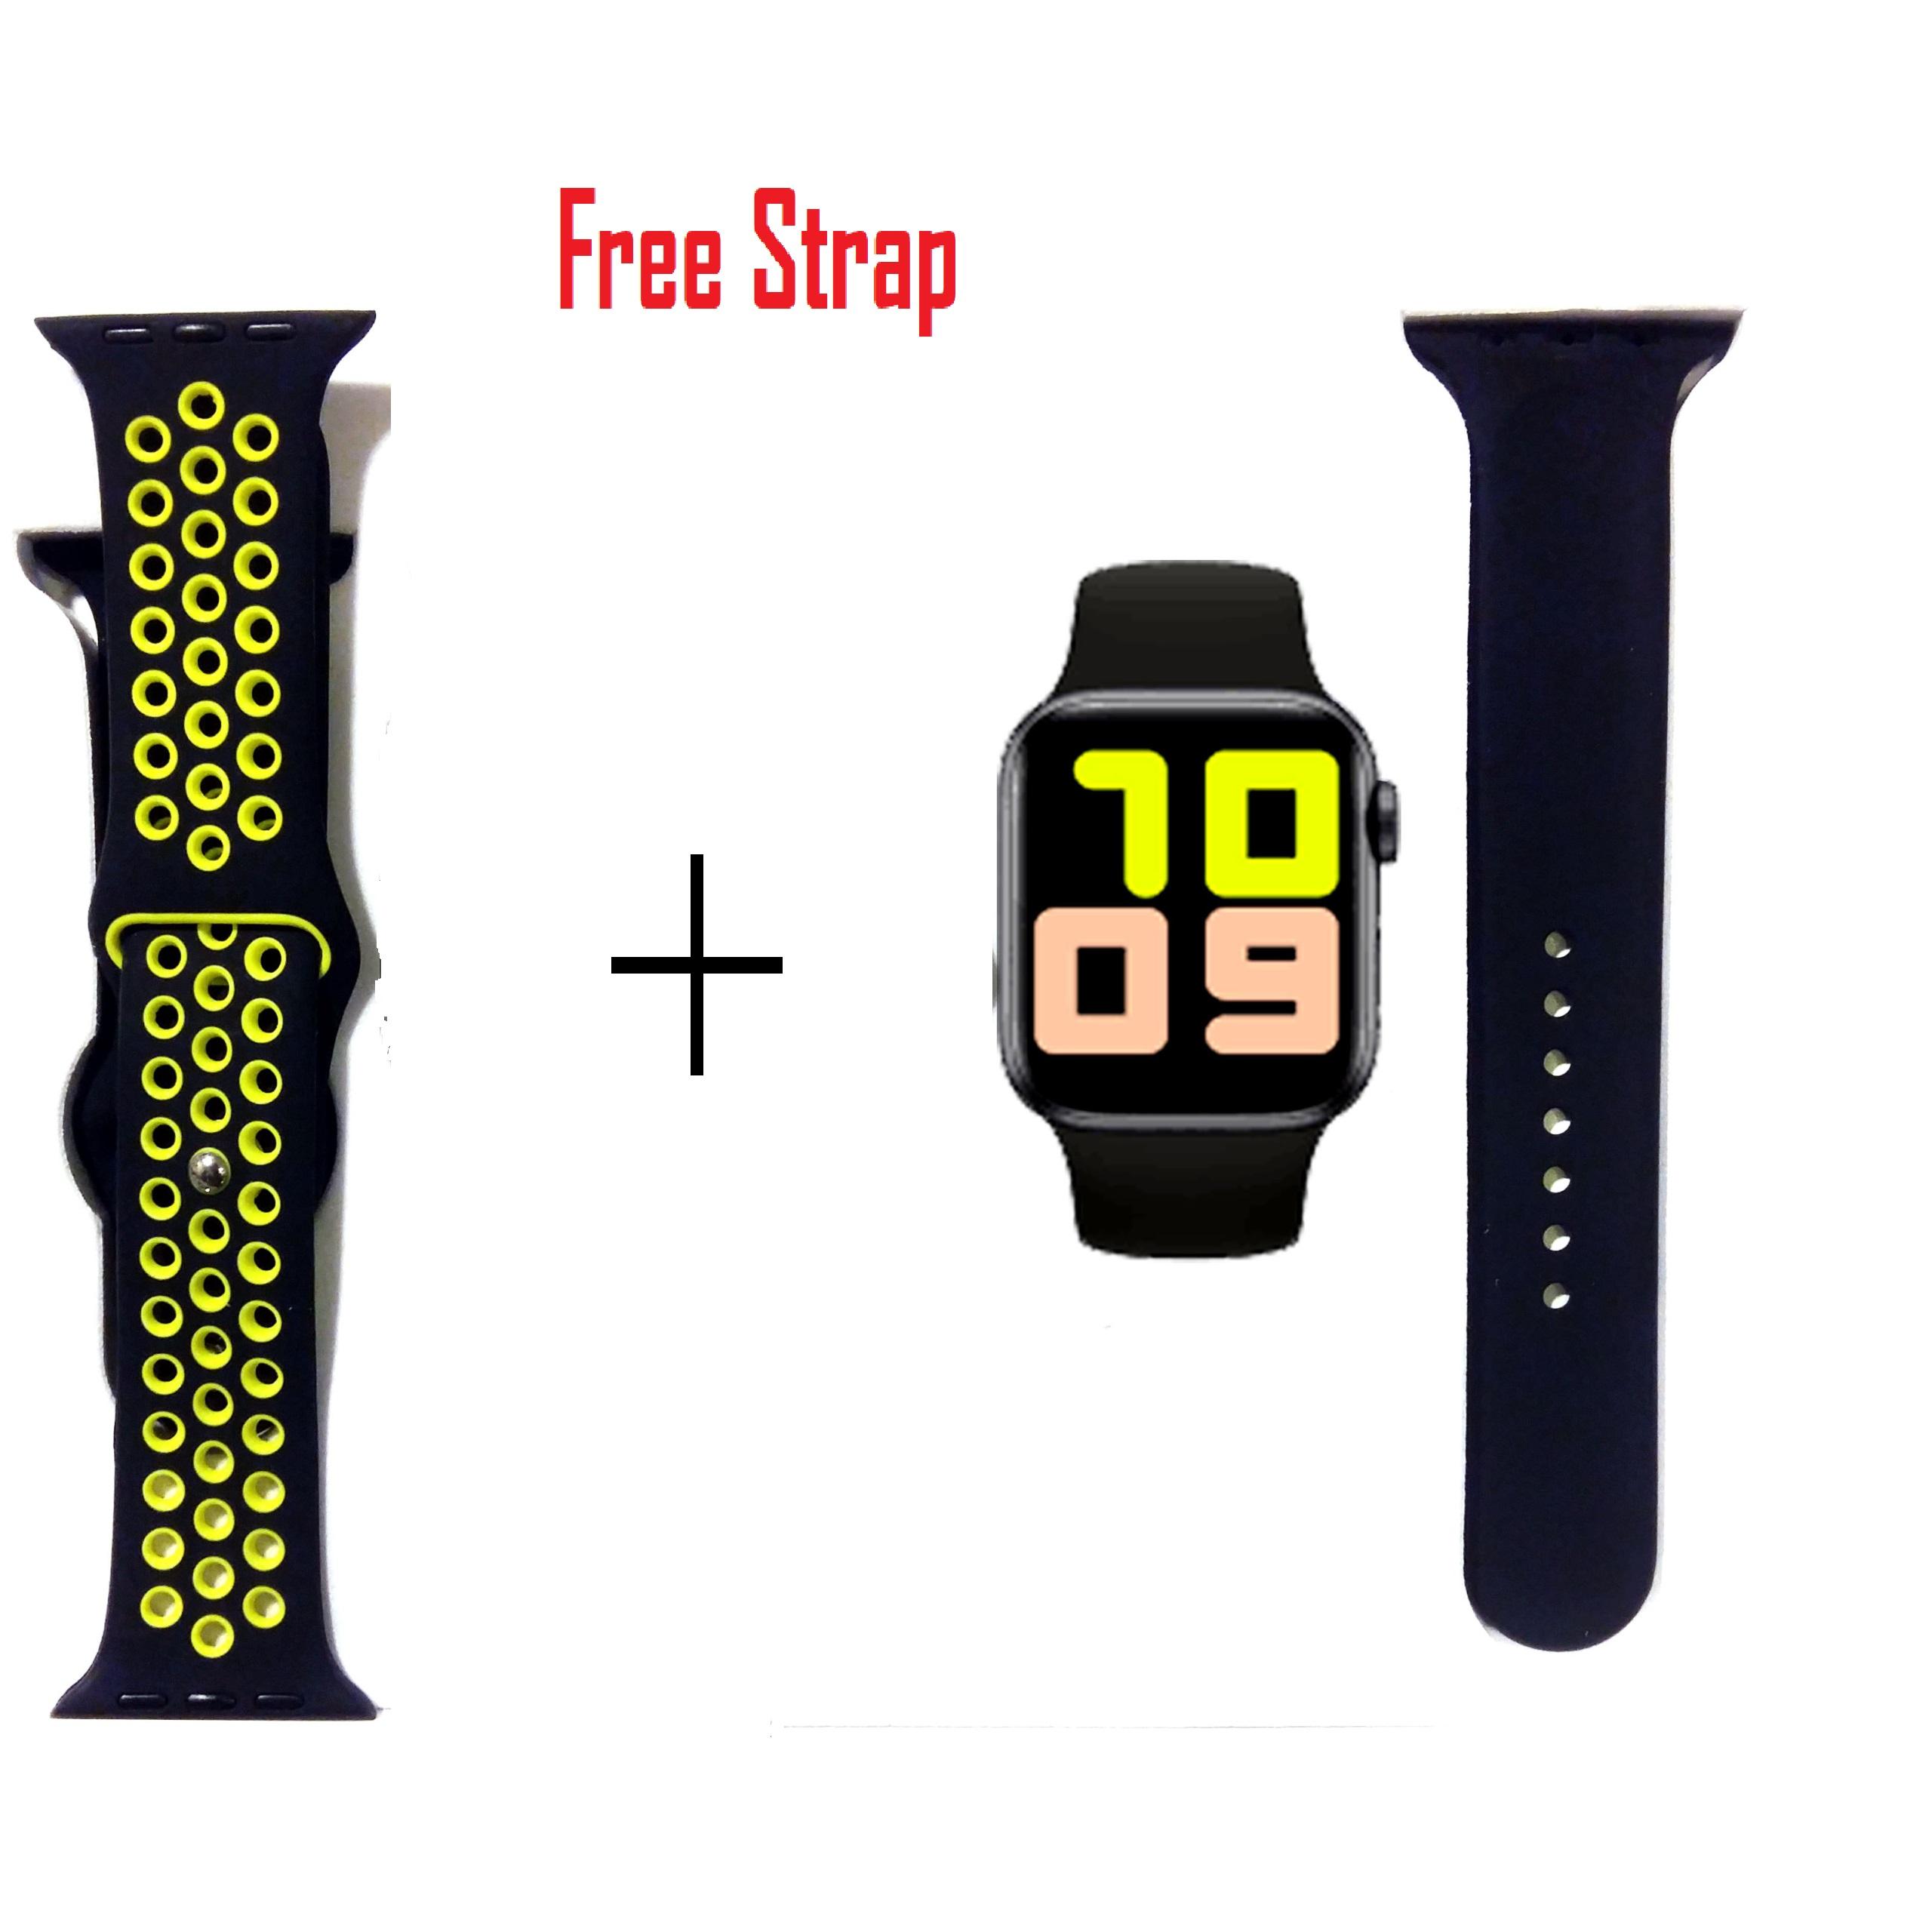 T500 + Bluetooth Smart Calling Watch 2 Straps